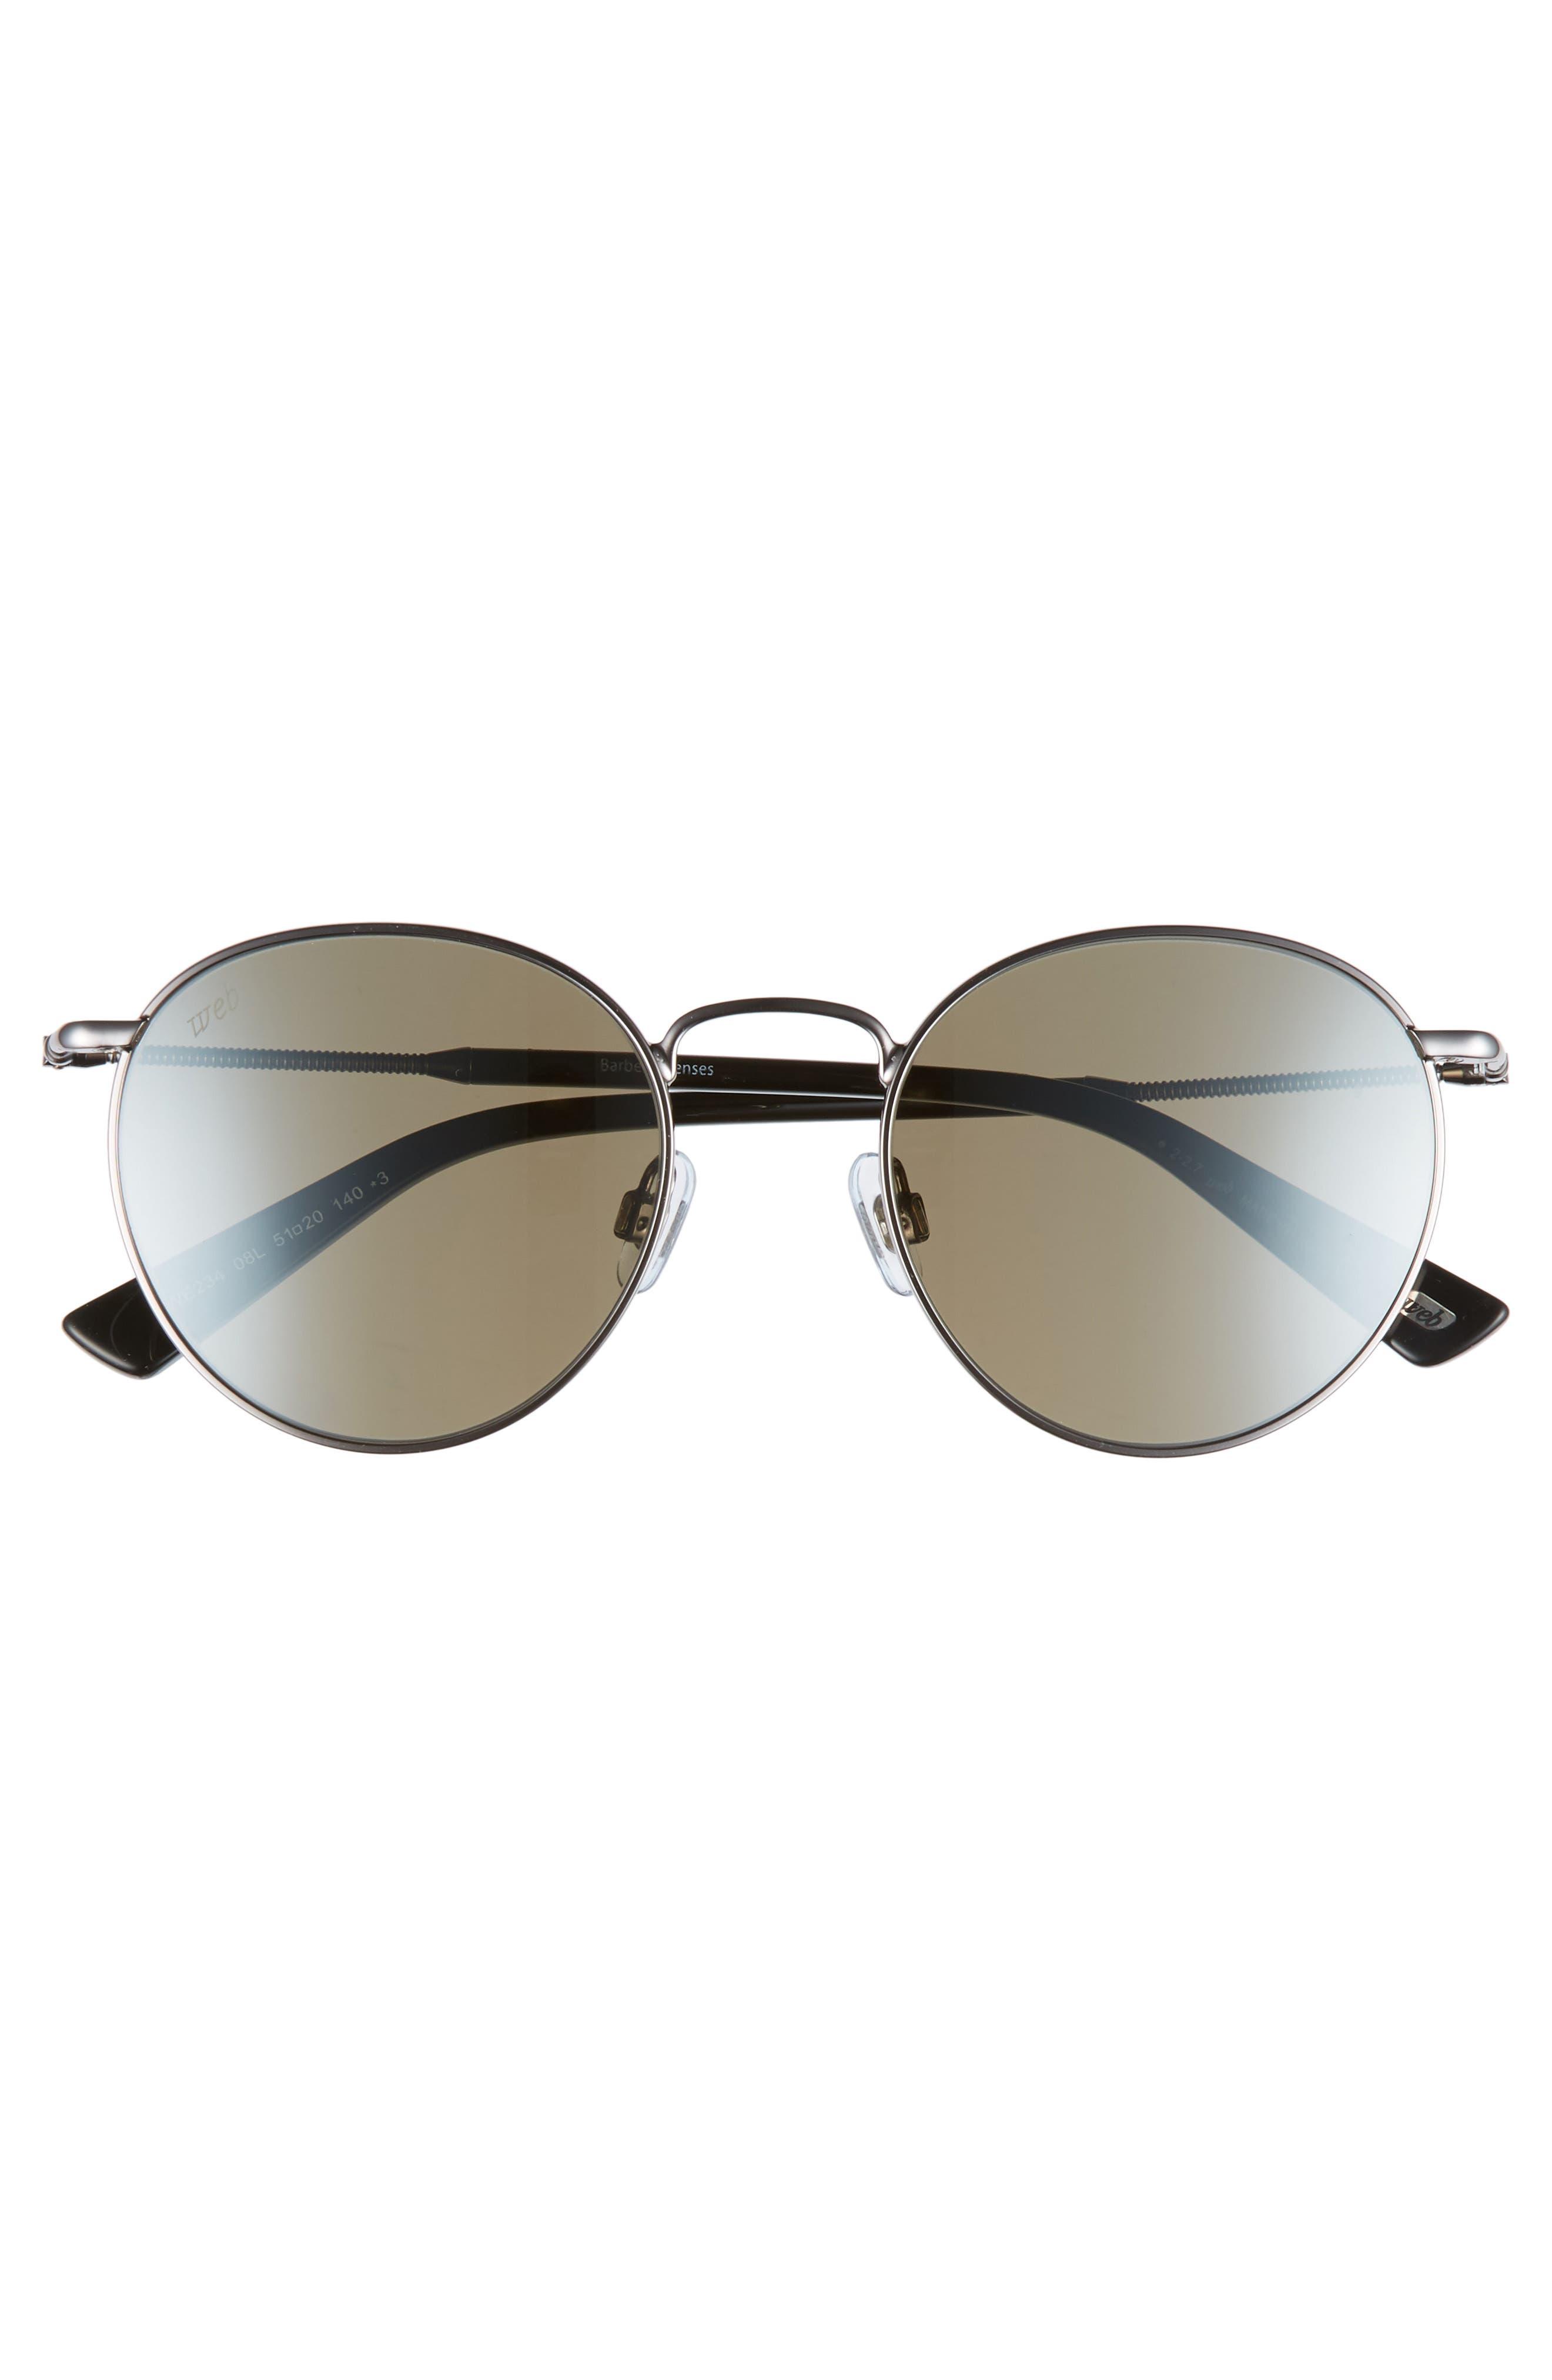 51mm Round Metal Sunglasses,                             Alternate thumbnail 3, color,                             SHINY GUNMETAL/ ROVIEX MIRROR